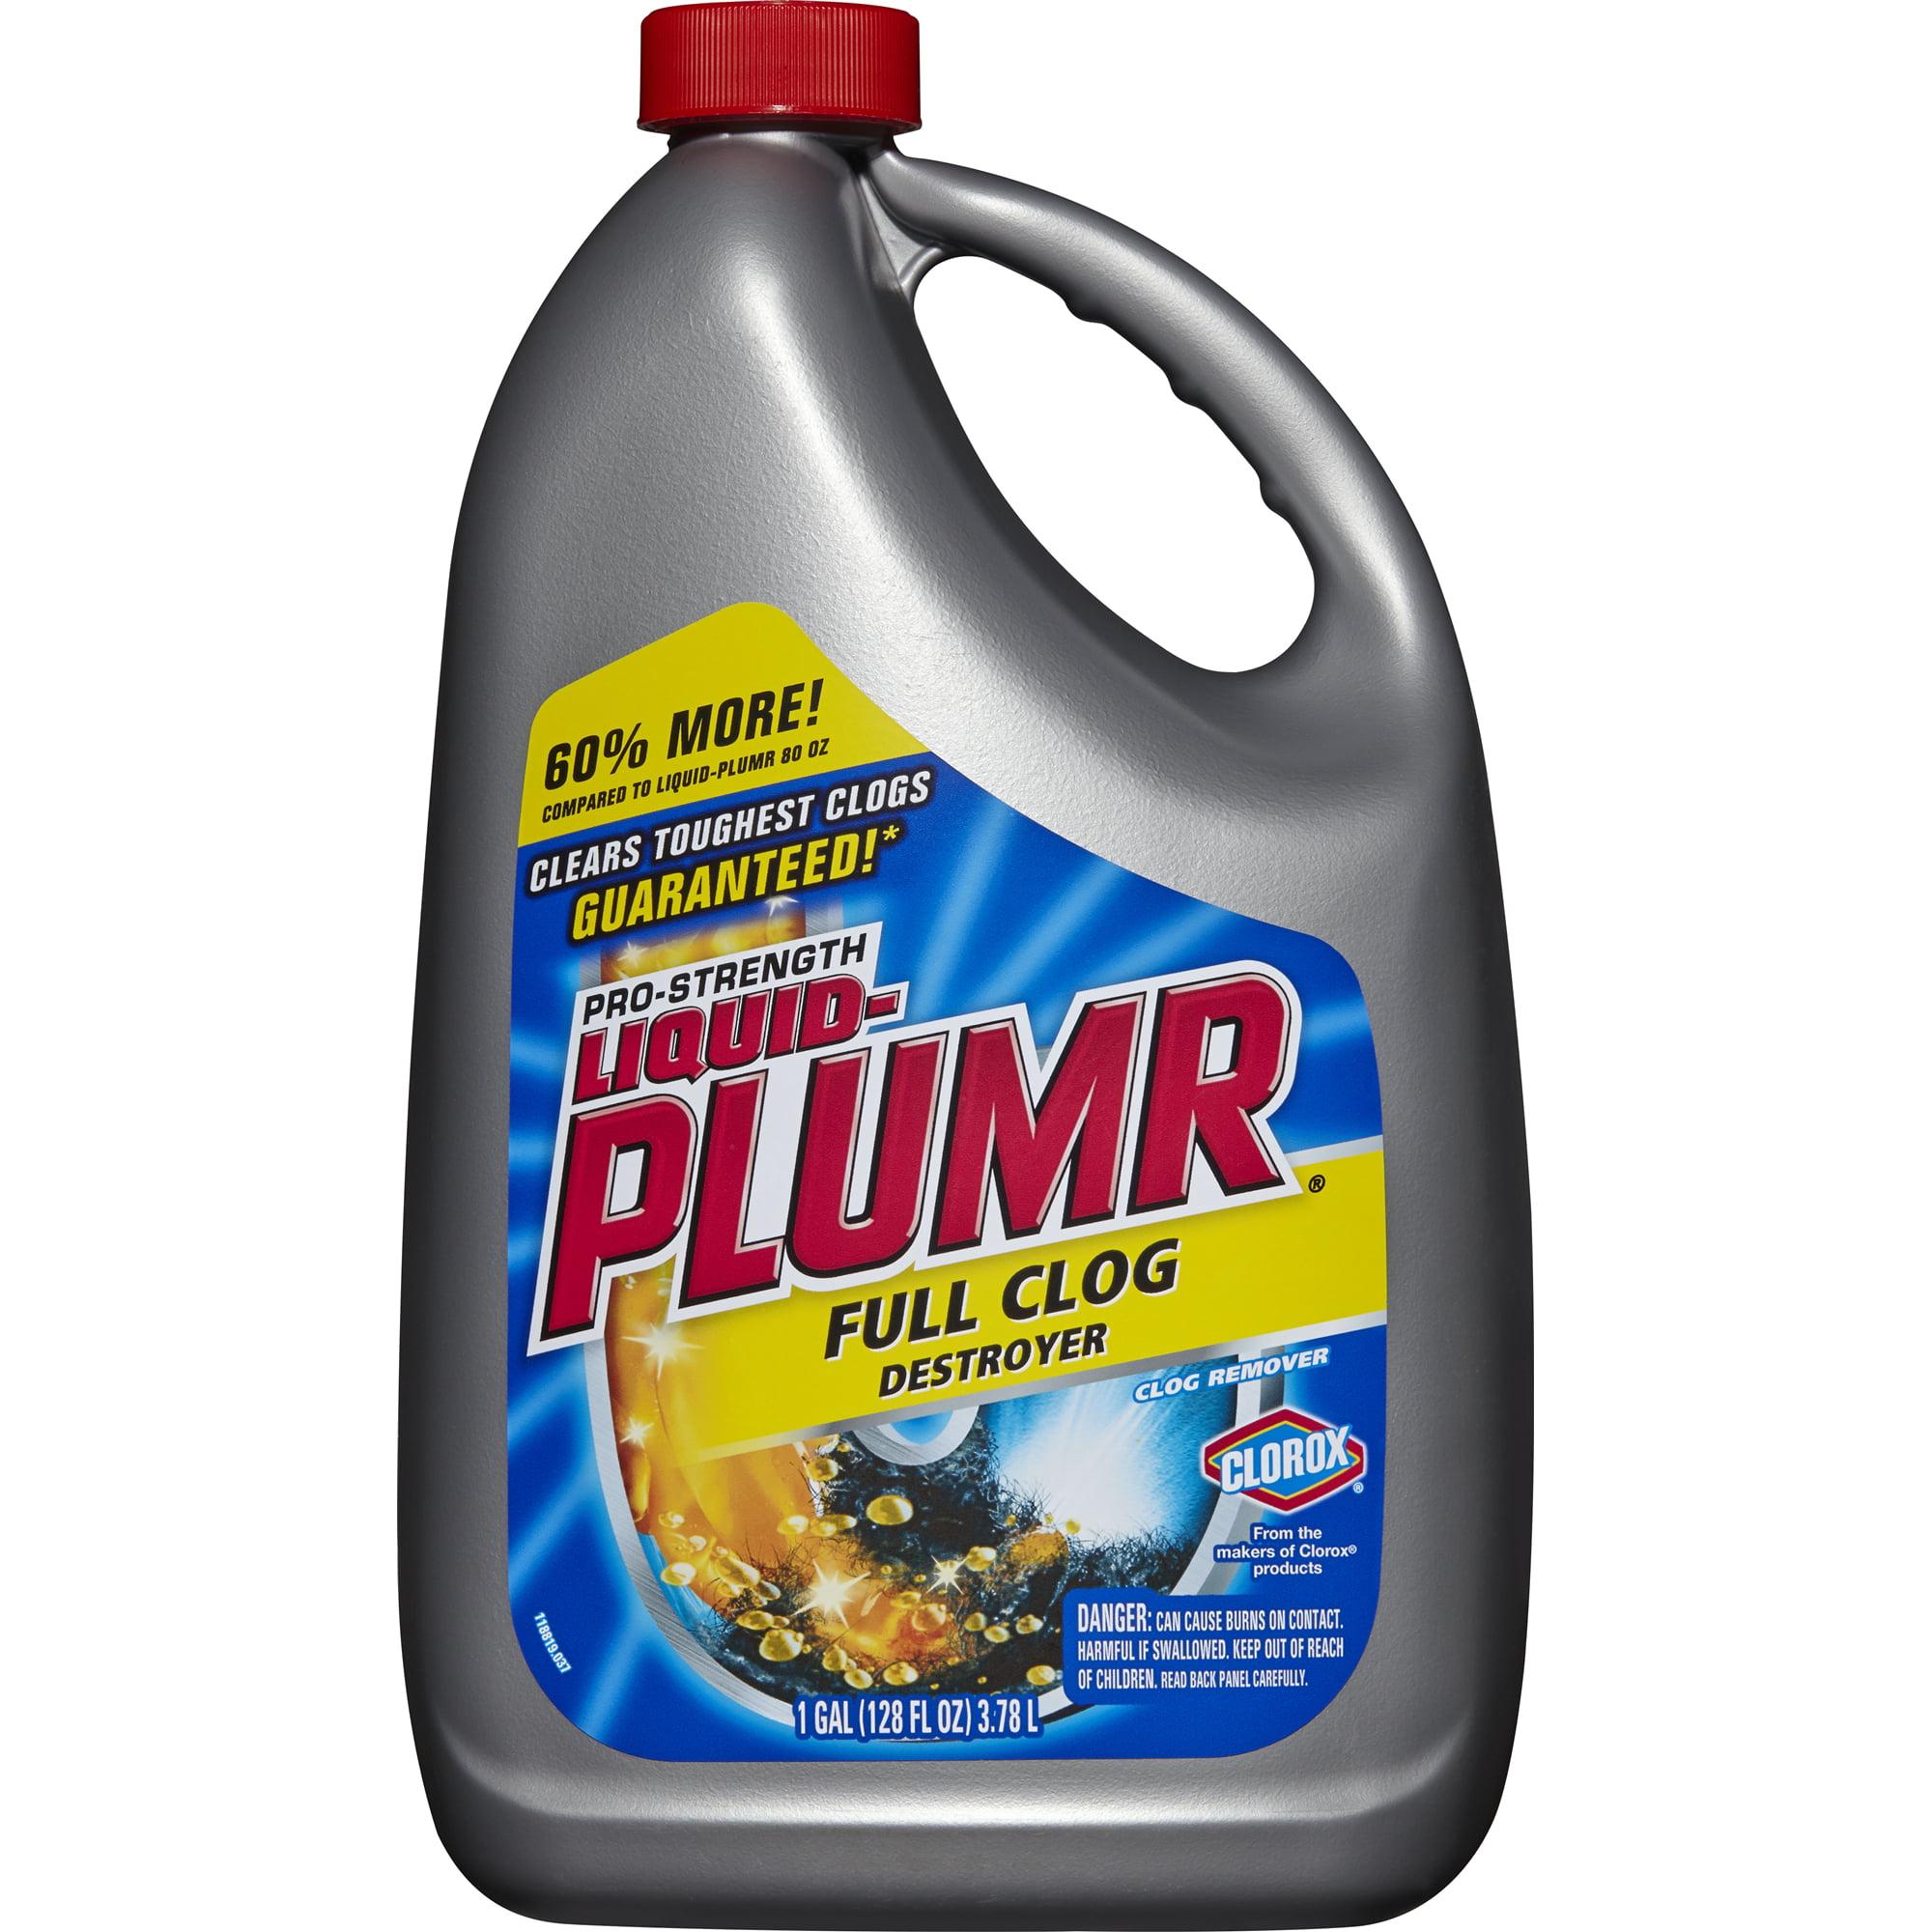 Liquid Plumr Pro Strength Full Clog Destroyer Plus Pipeguard 160 Oz